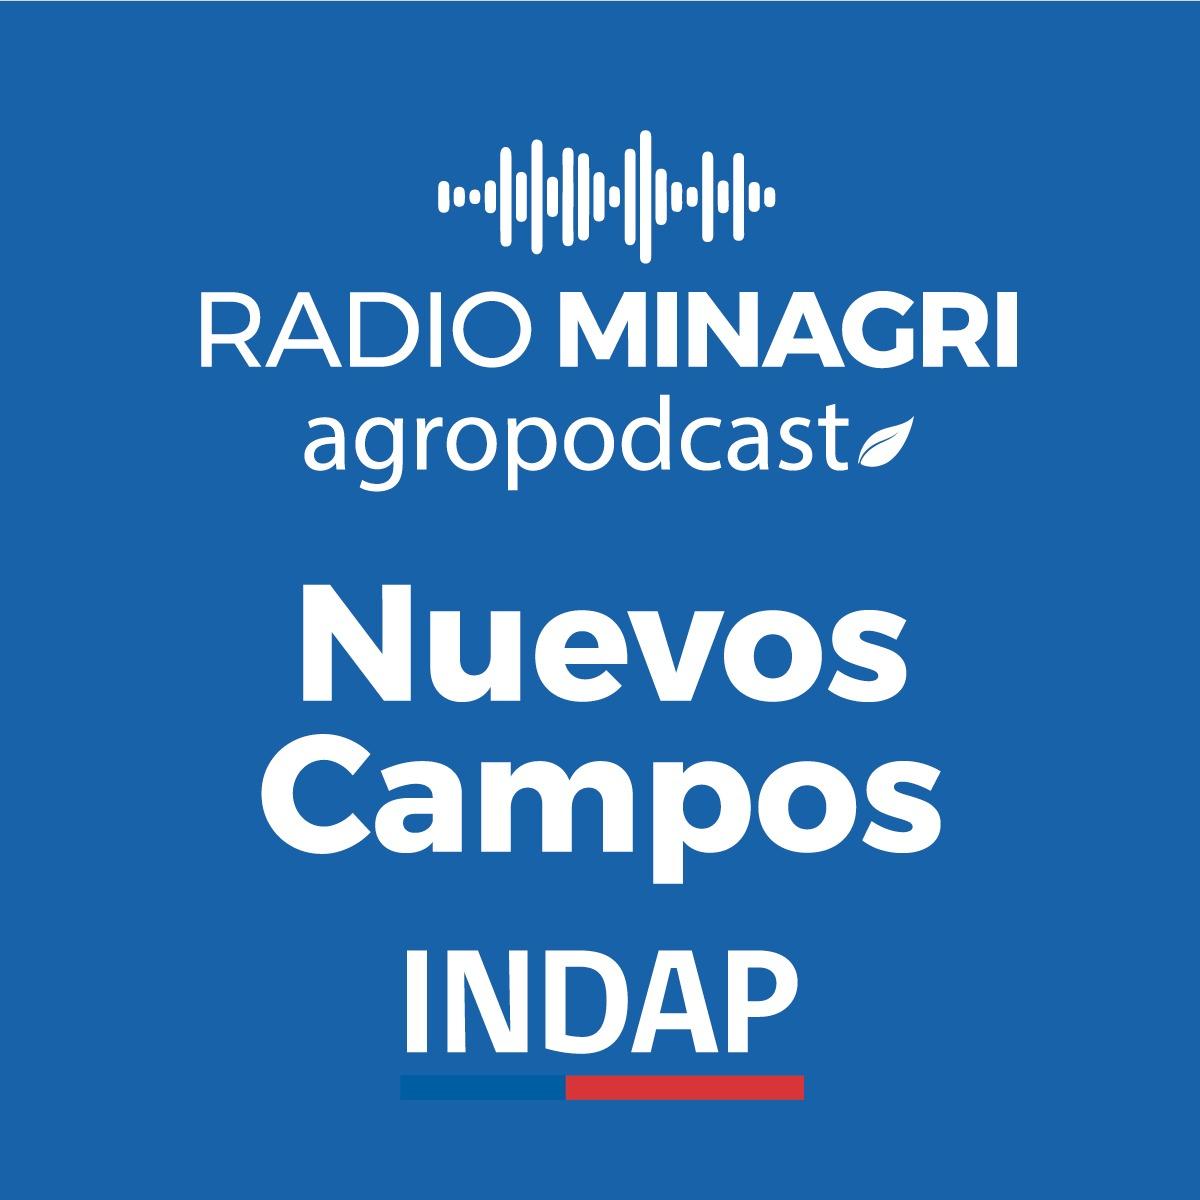 Nuevos campos – Episodio 3: Seguros INDAP